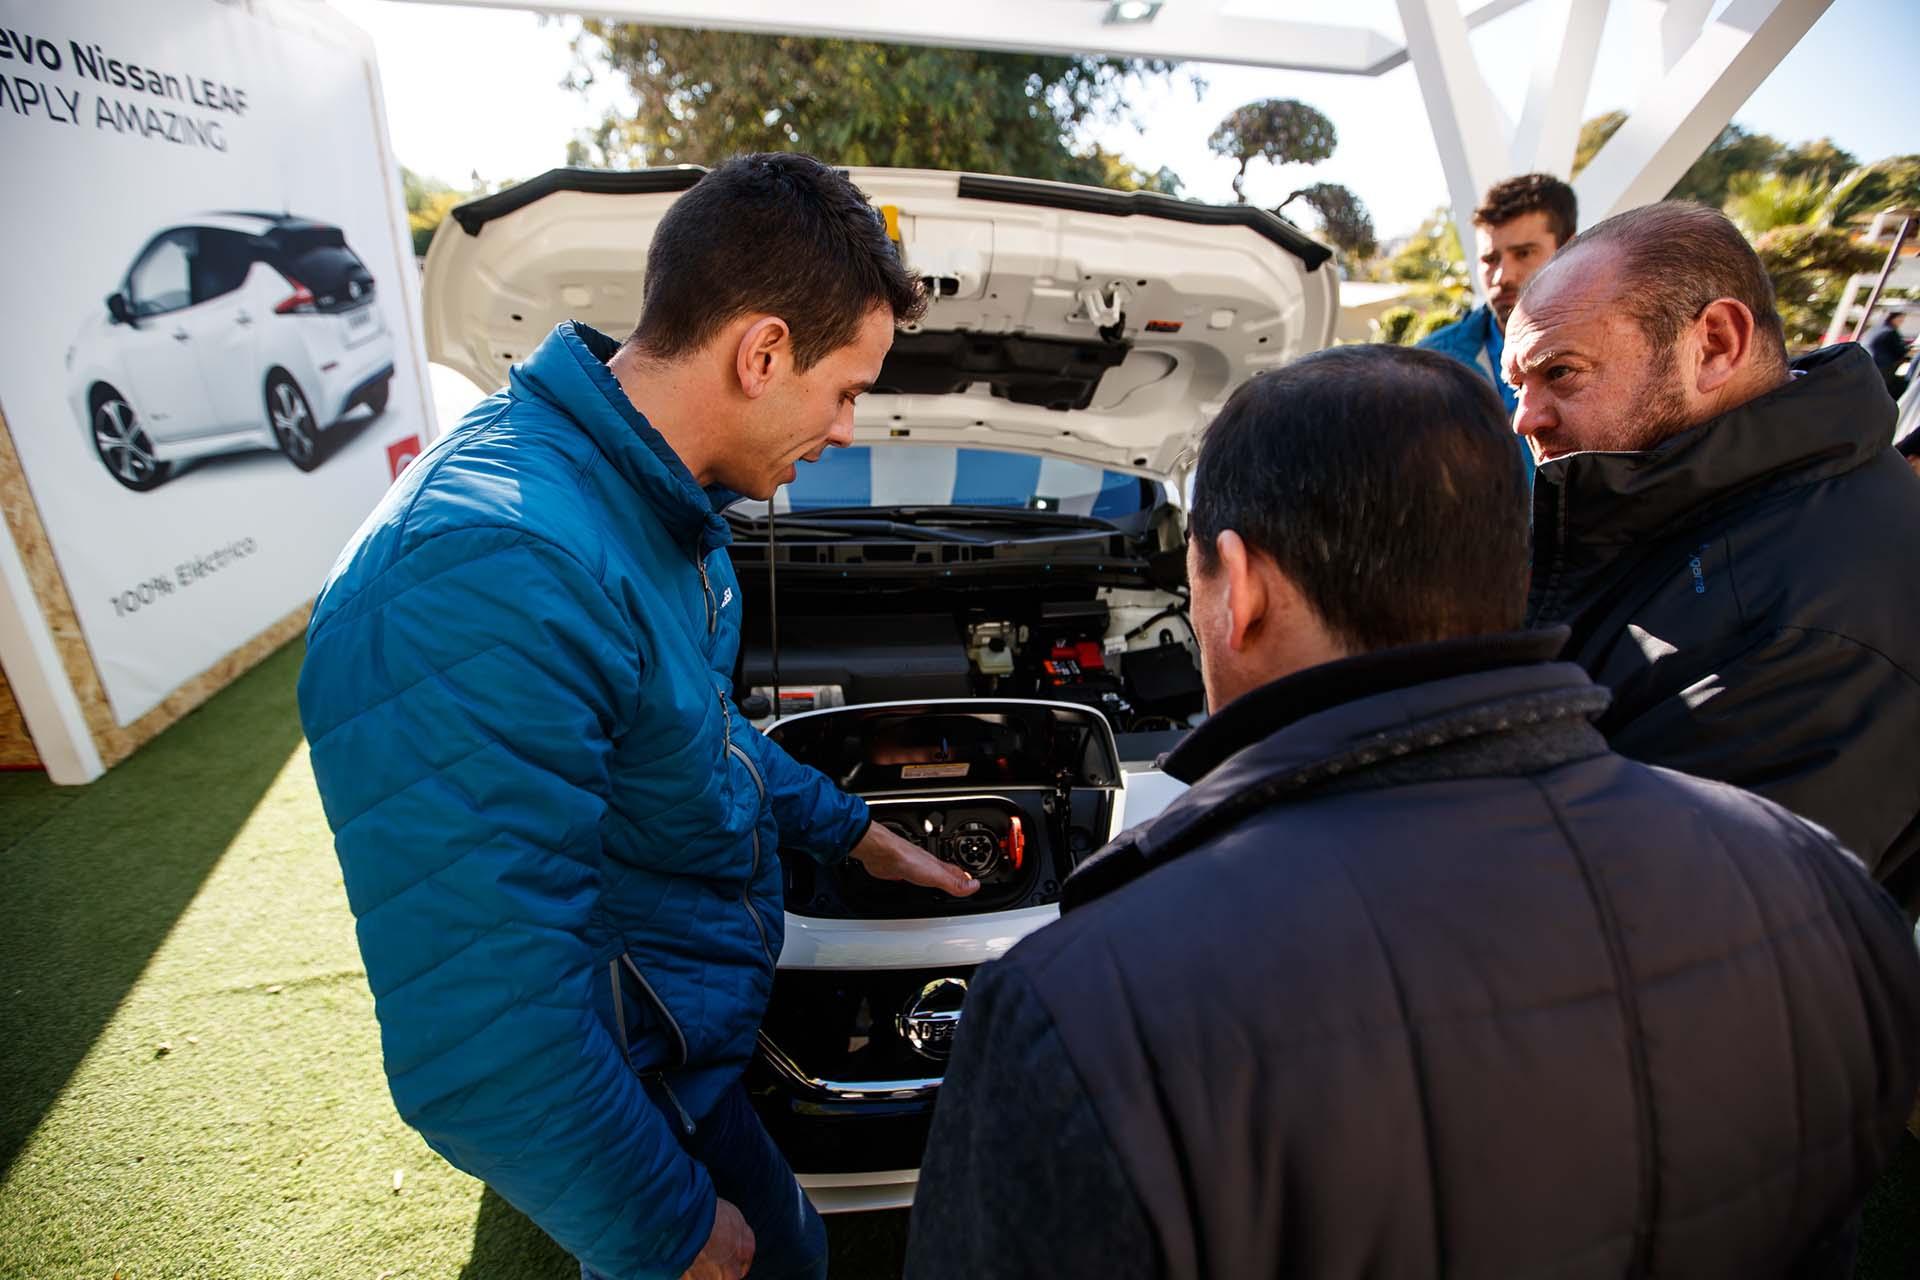 Roadshow nissan leaf event. Area testing drive design